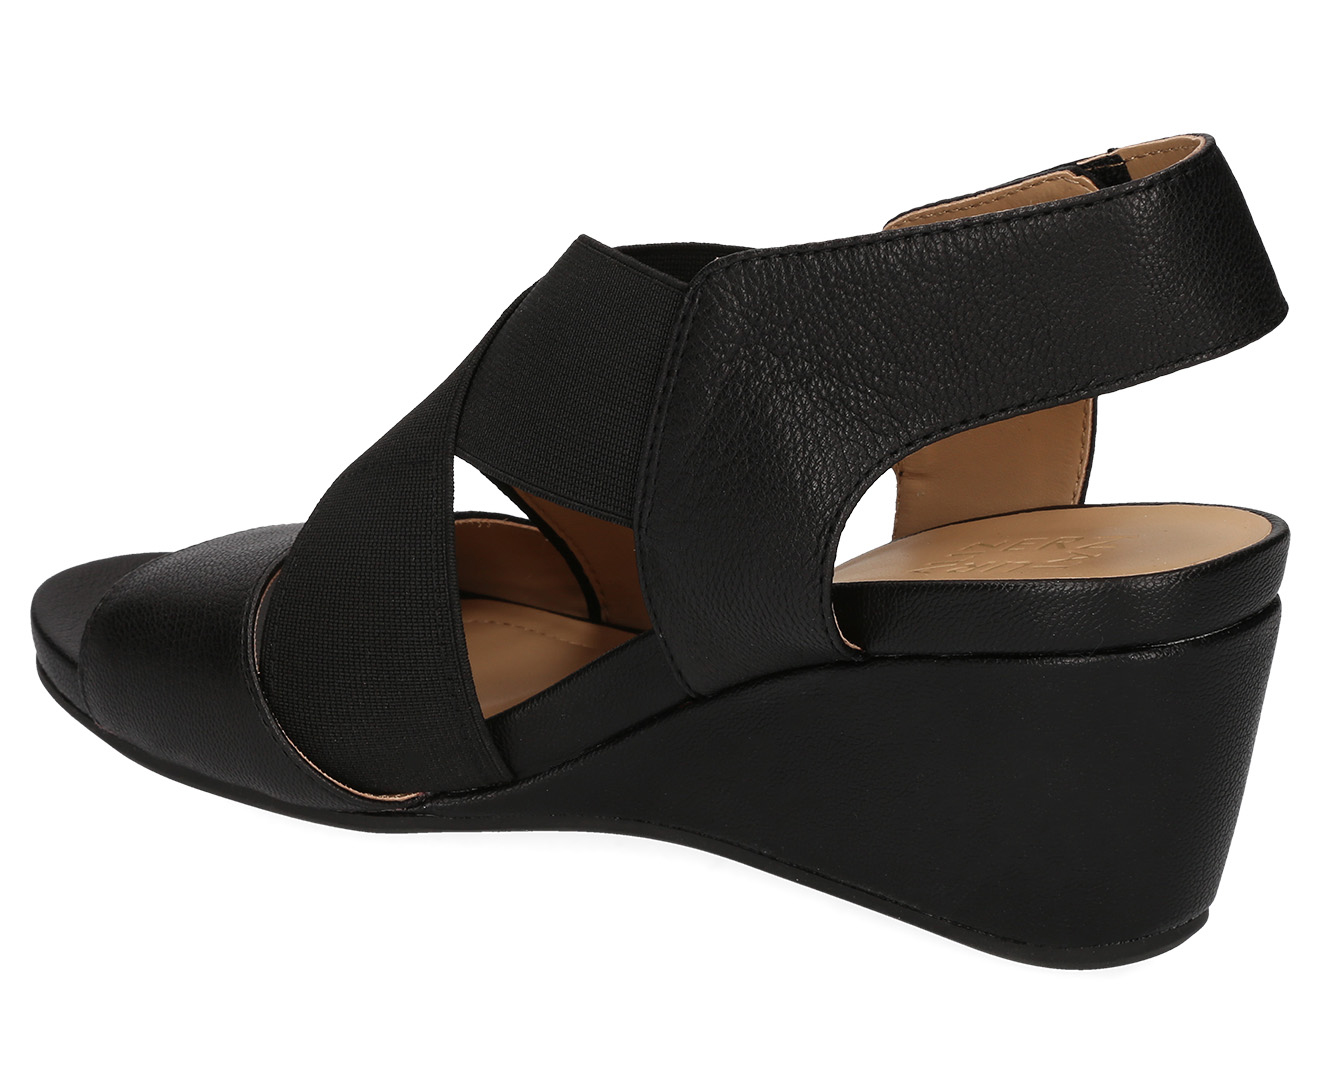 Naturalizer Women's Cleo Wedge Sandal Black